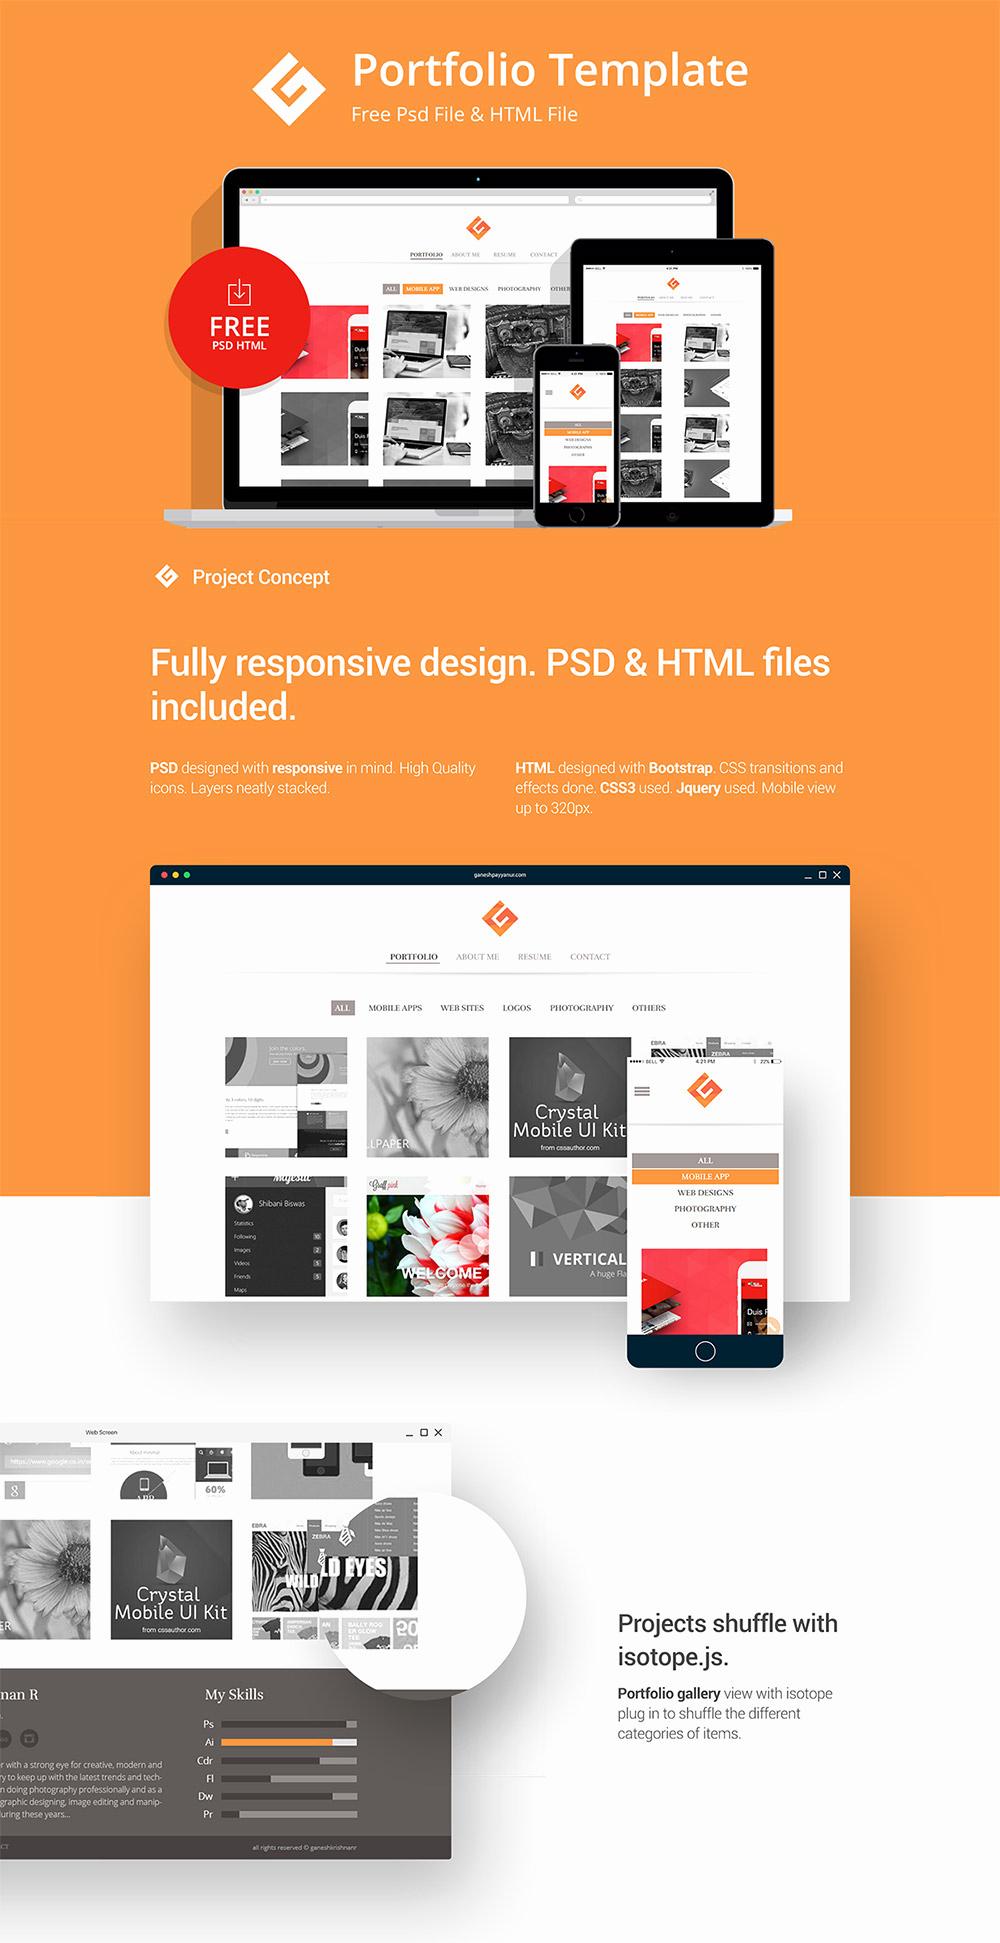 Free Portfolio Website Templates Best Of Download Free Minimalistic Personal Portfolio Website